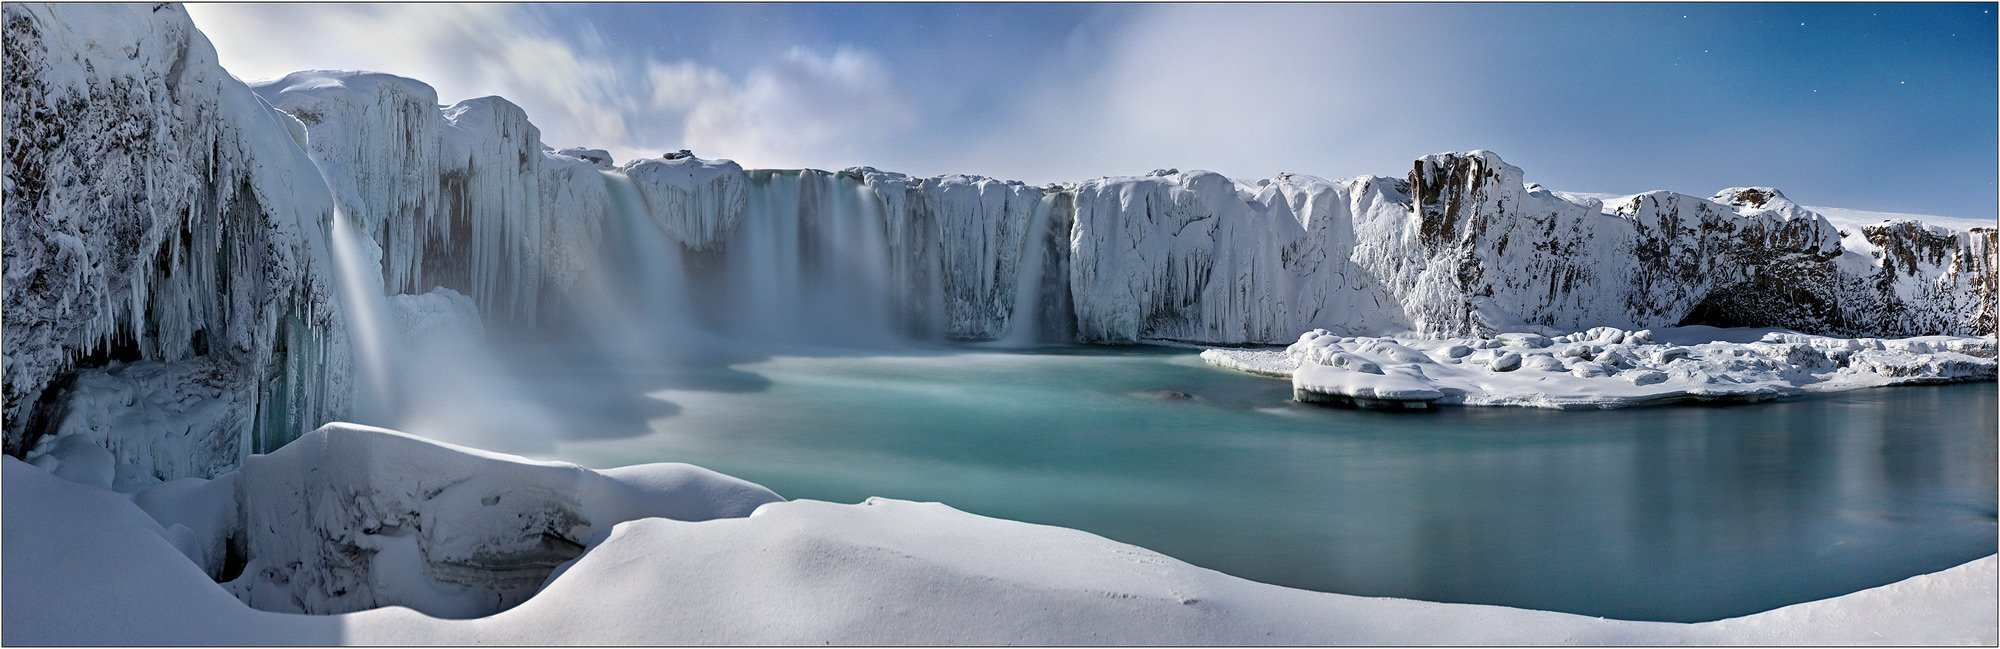 водопад, годафосс, исландия, iceland, godafoss, waterfalls, izh Diletant (Валерий Щербина)